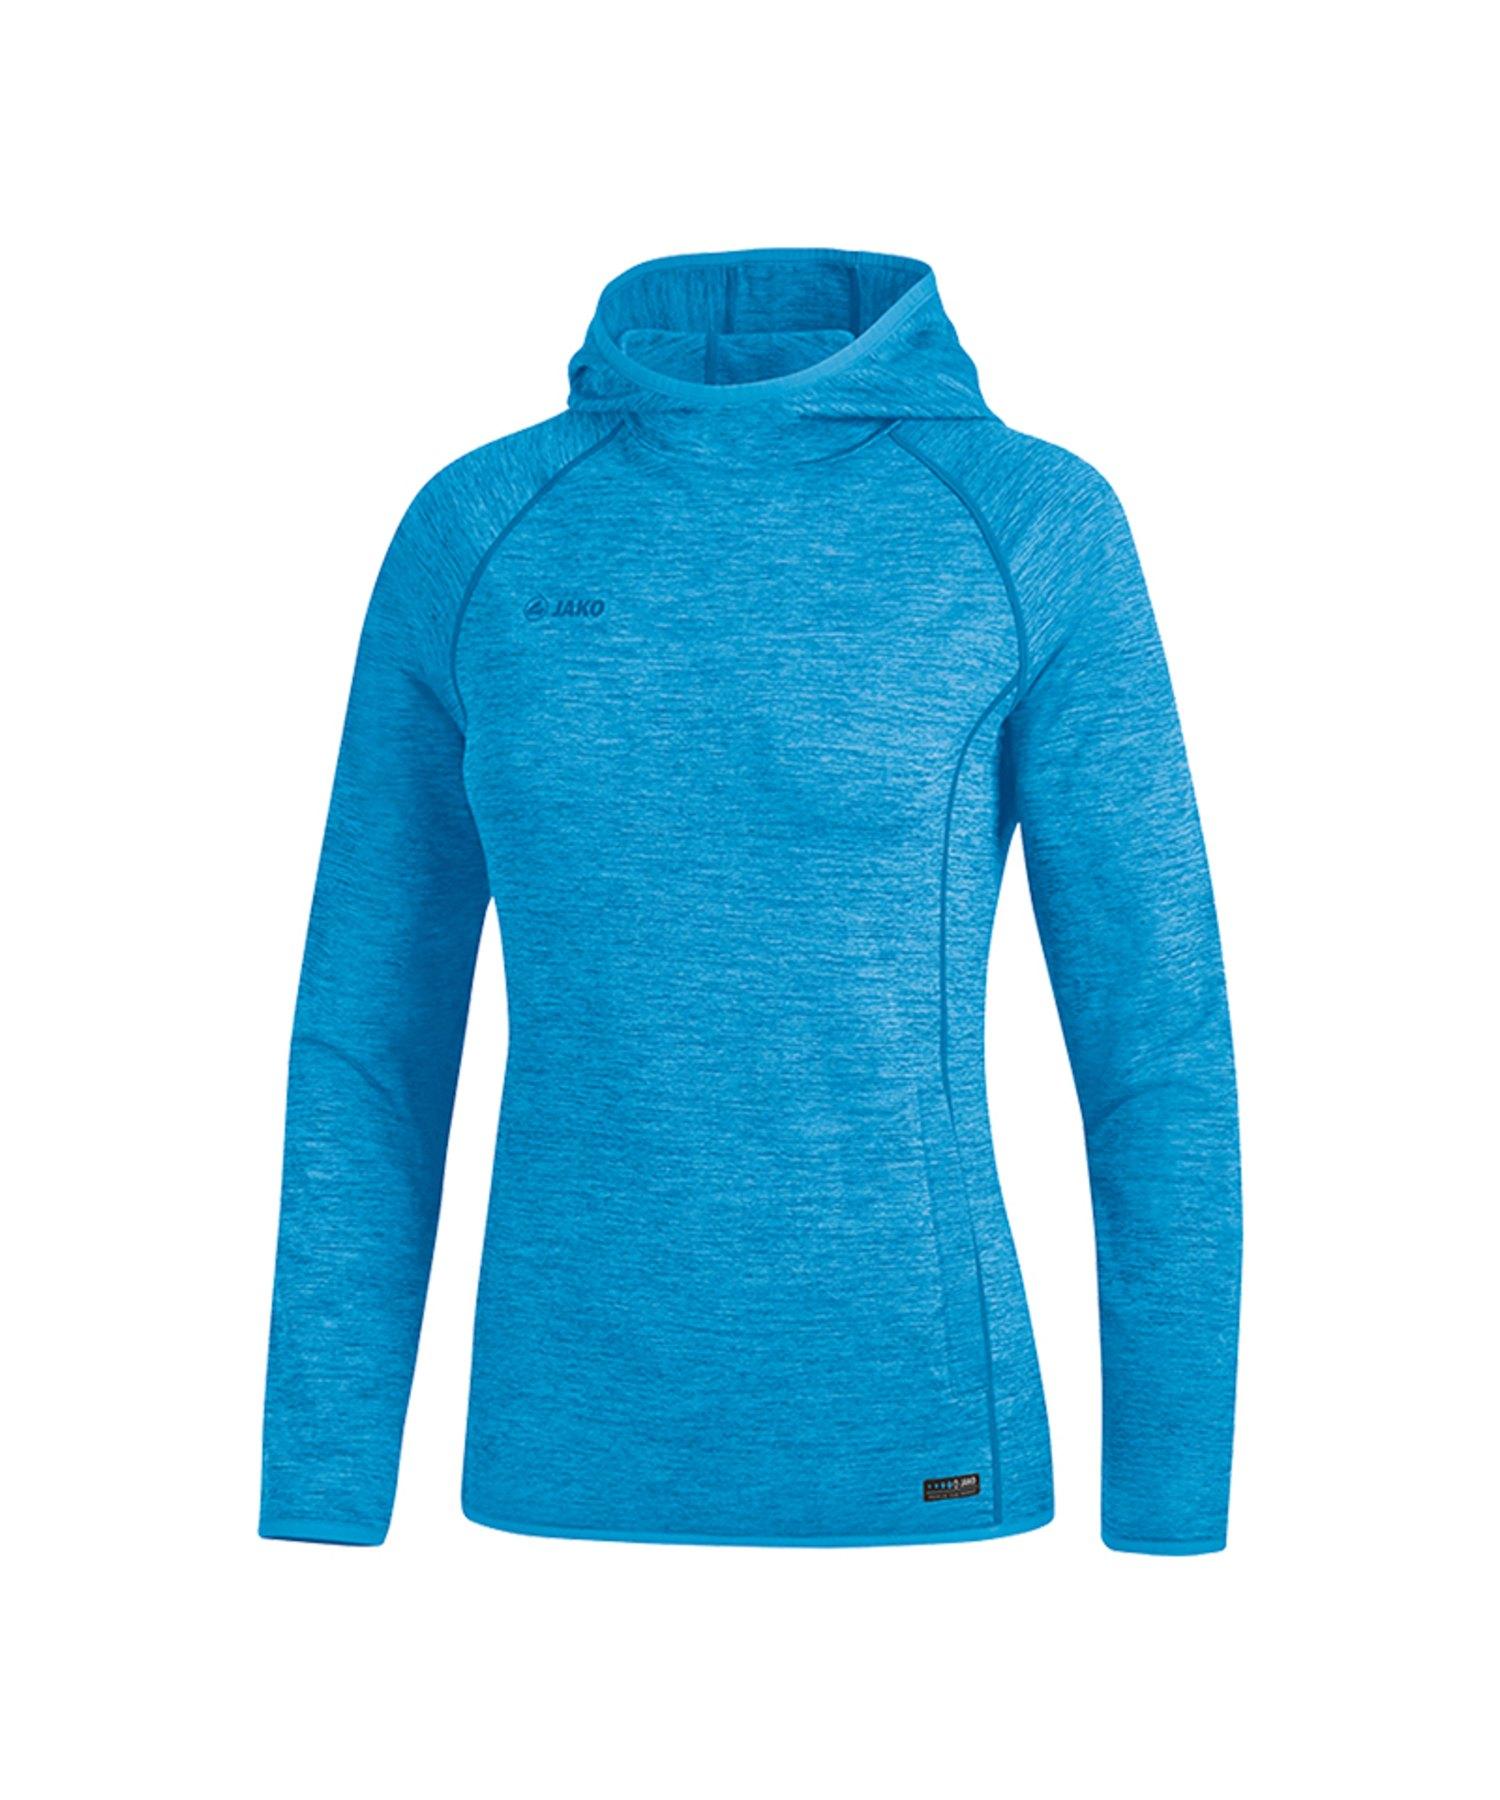 Jako Active Kapuzensweatshirt Damen Blau F89 - Blau